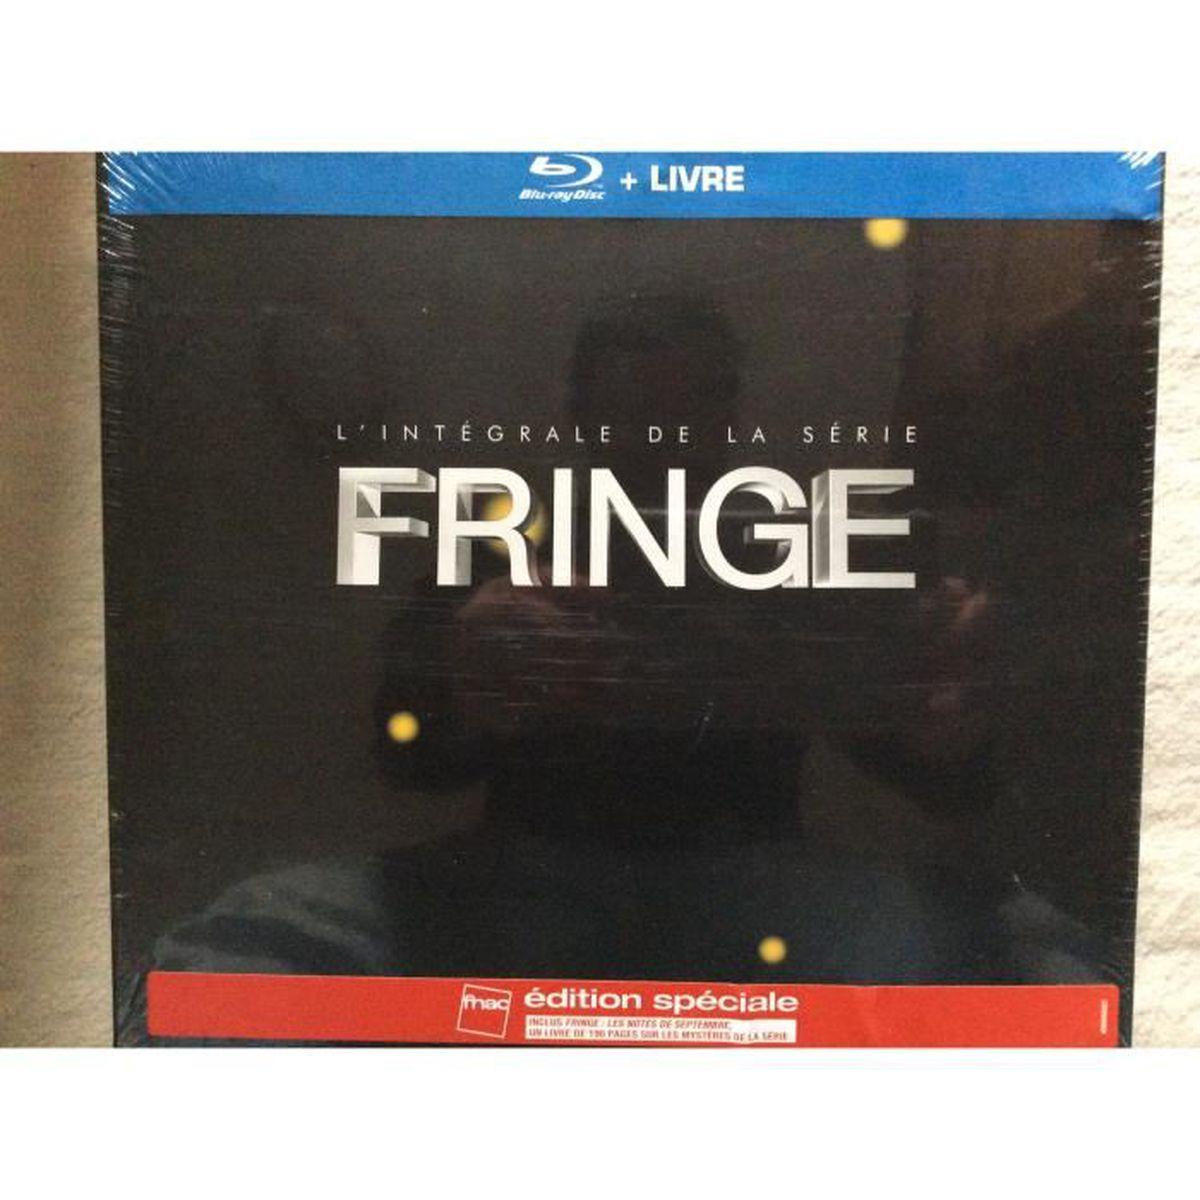 BLU-RAY SÉRIE Fringe Edition spéciale Fnac